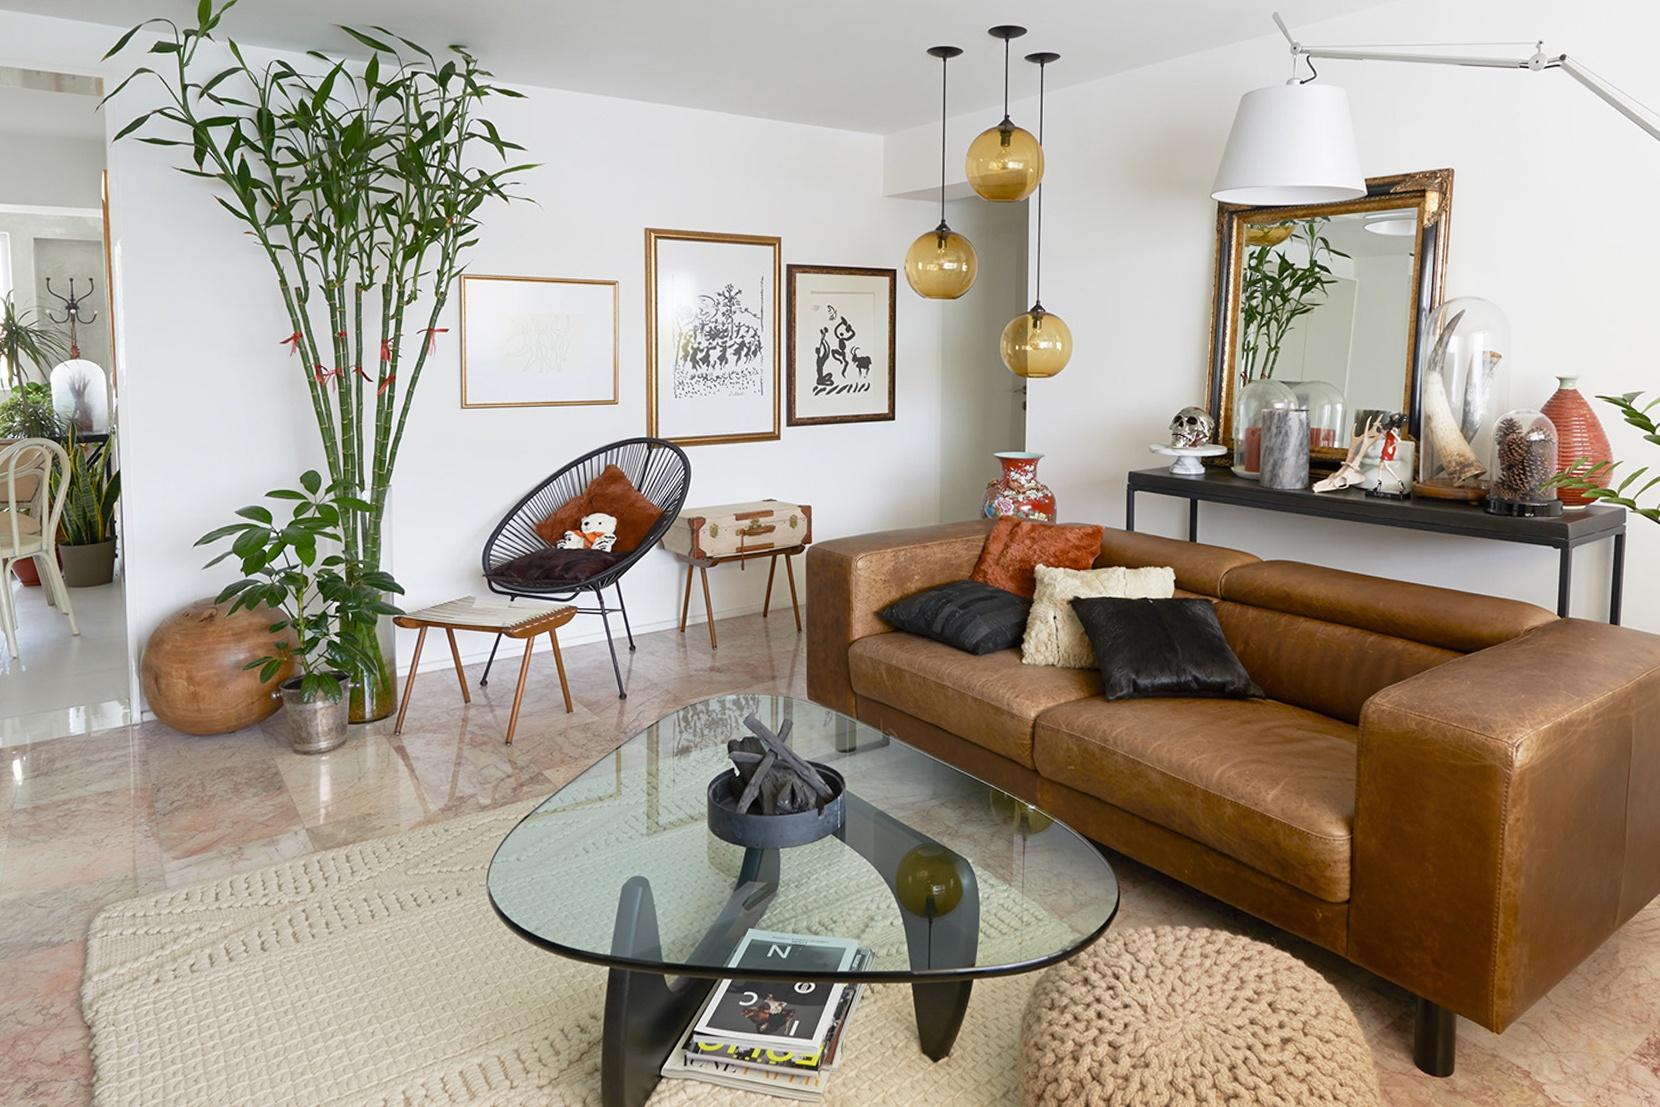 Modern-Living-Room-Lighting-Projects-Jeremy-Tan-Amber-Orbs.jpg